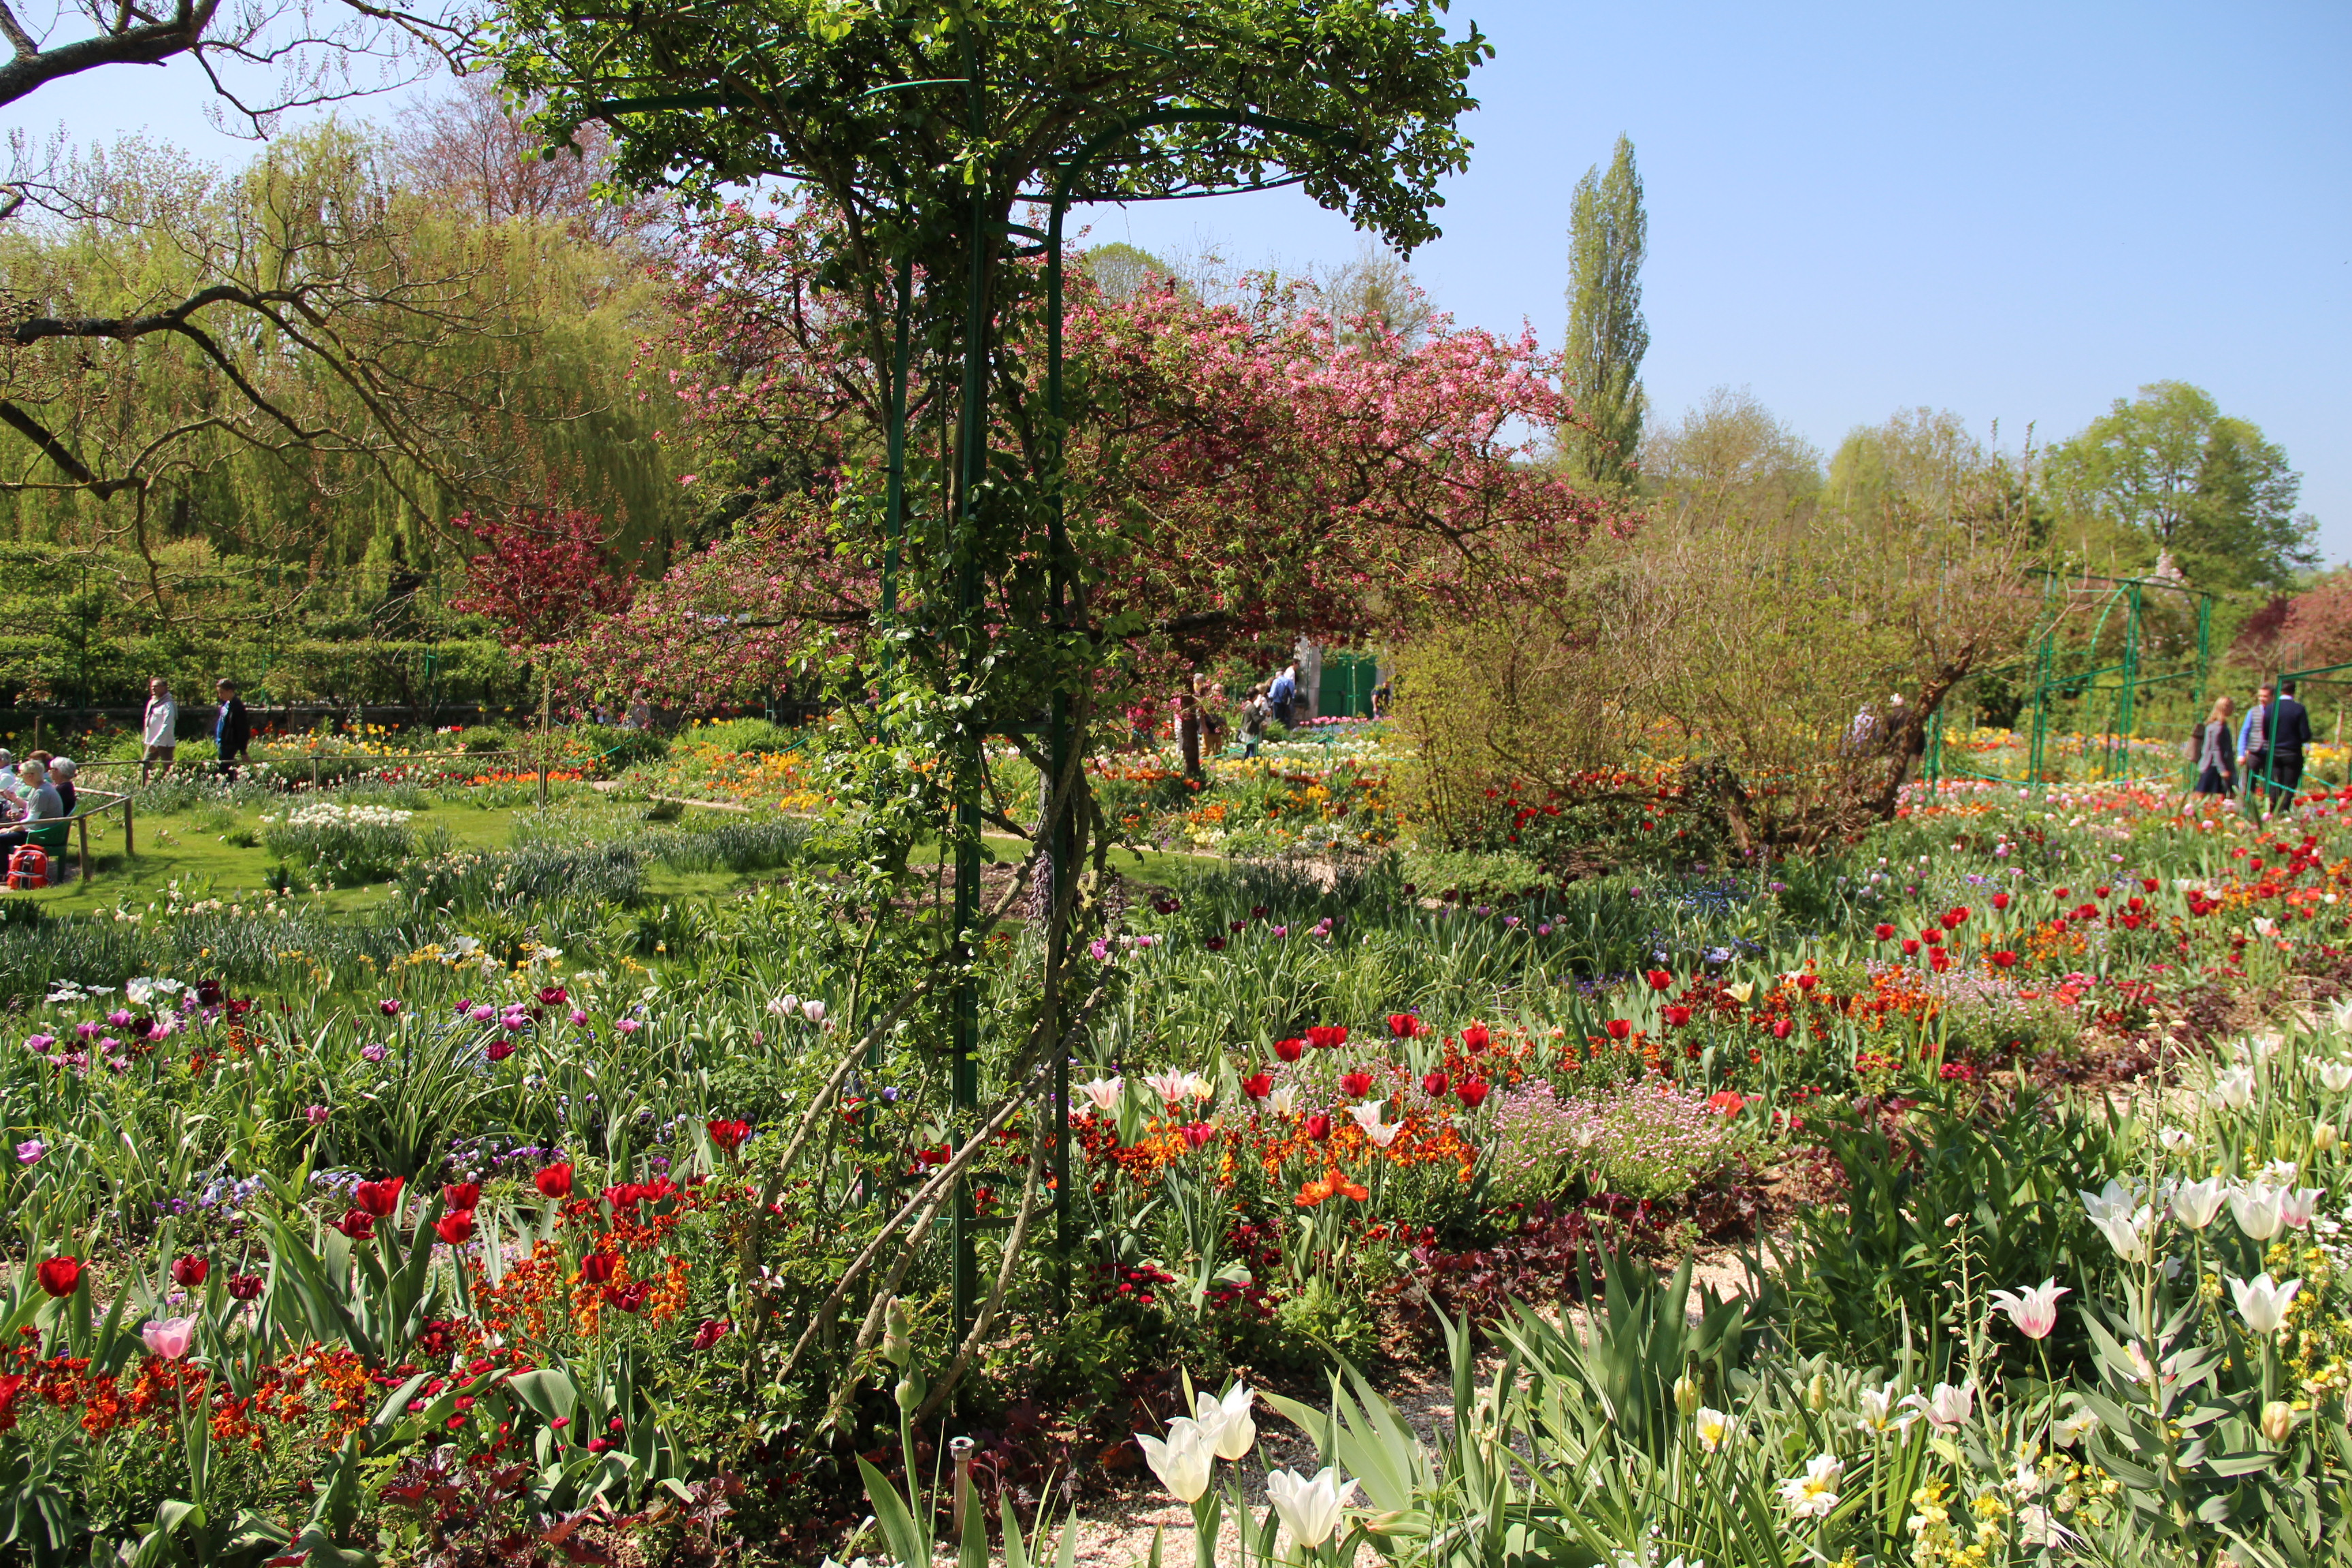 File:Giverny, Fondation Claude Monet, jardin5.jpg - Wikimedia Commons